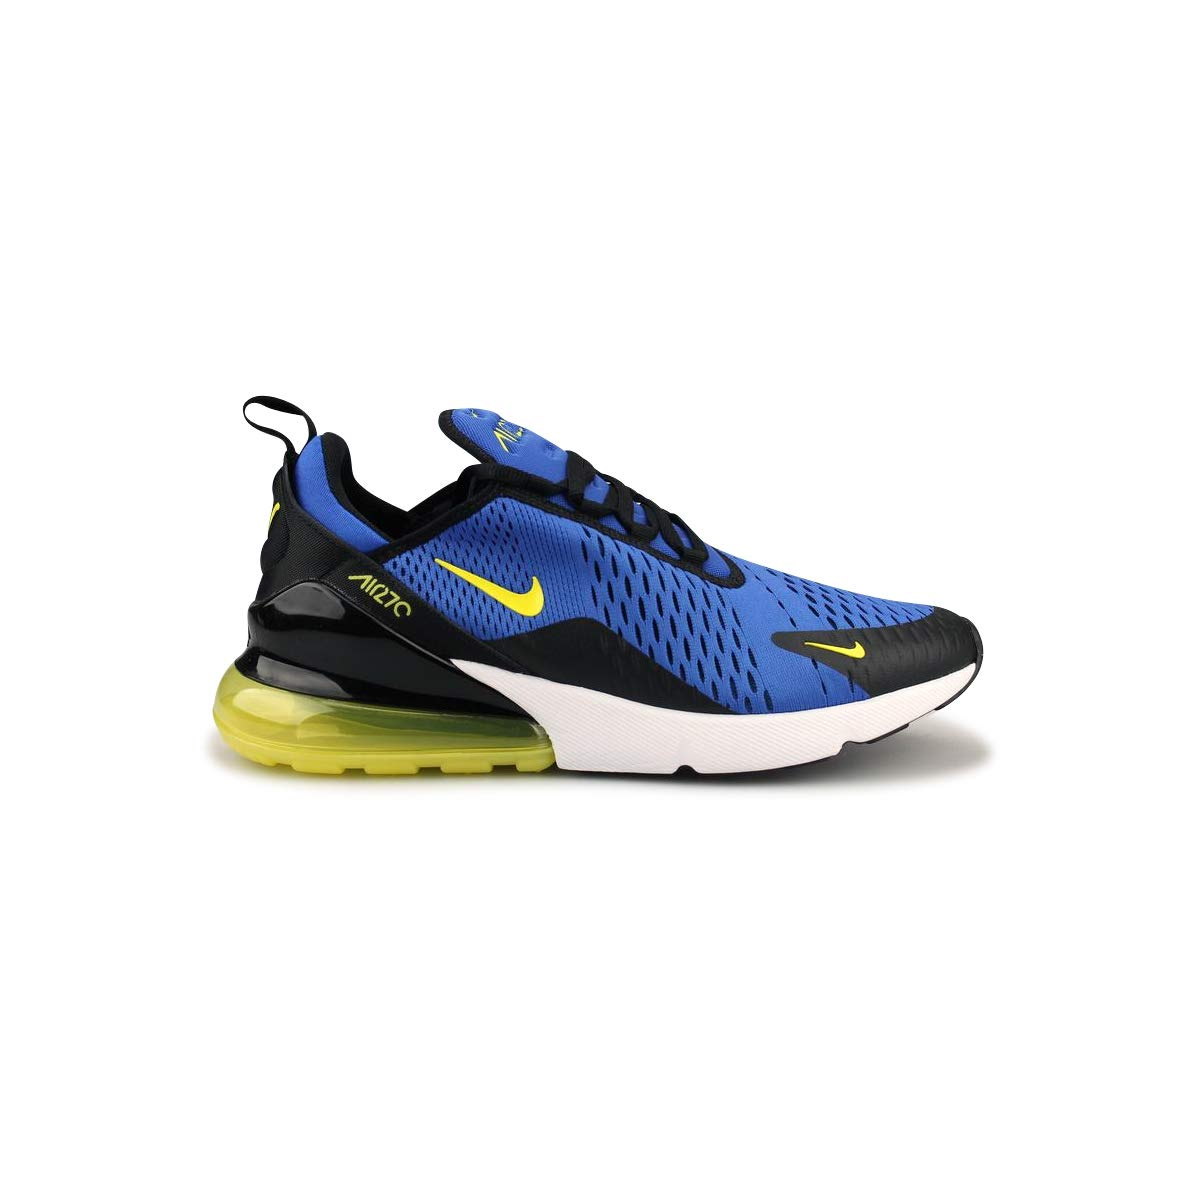 Nike Mens Air Max 270 Running Shoes (9.5 M US, Game RoyalDynamic Yellow)